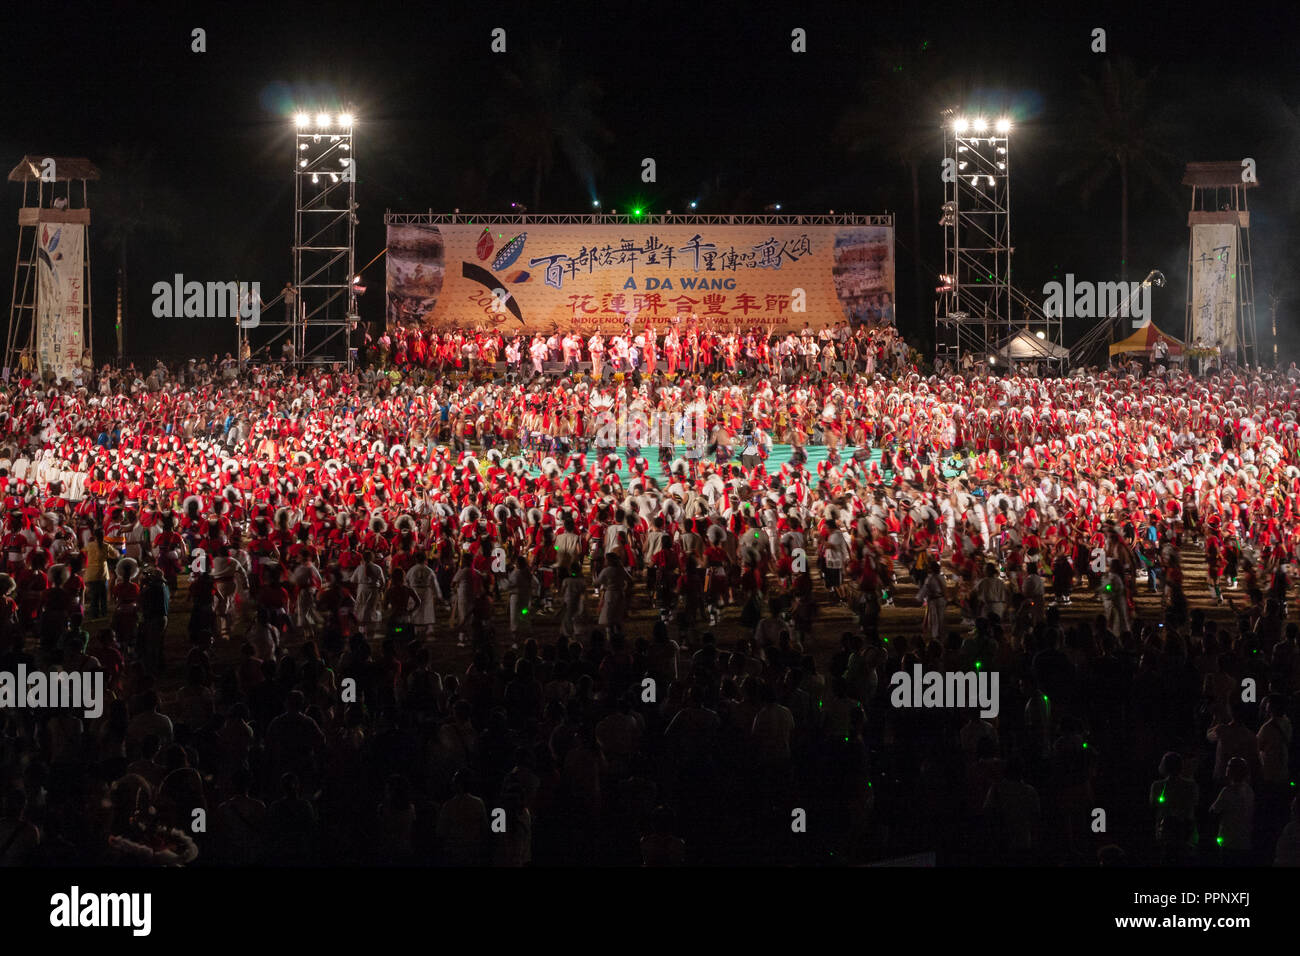 2009' ein DA WANG' indigenen Kulturen Festival (Aboriginal Harvest Festival) in Hualien City, Hualien County, Taiwan Stockbild